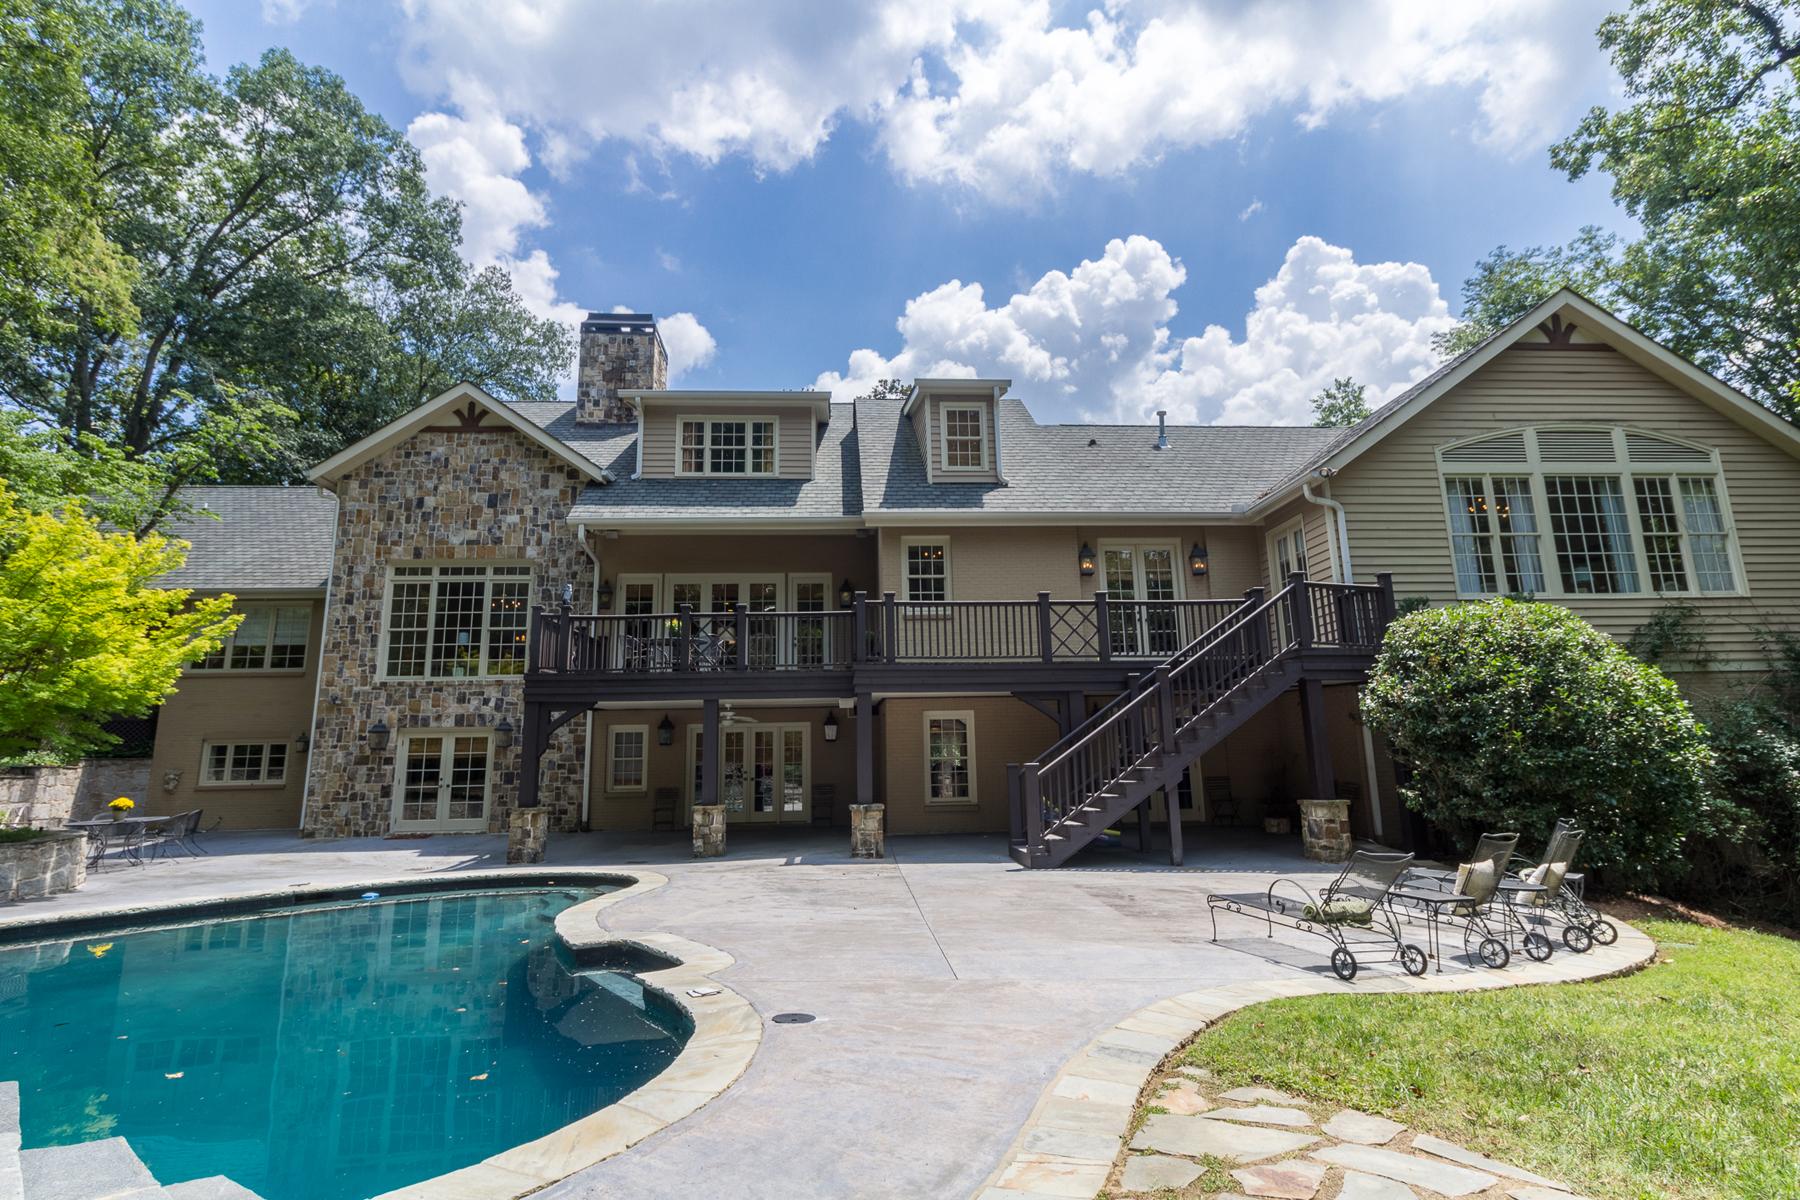 獨棟家庭住宅 為 出售 在 Spacious European Country Estate 3290 Ridgewood Road NW Paces, Atlanta, 喬治亞州, 30327 美國